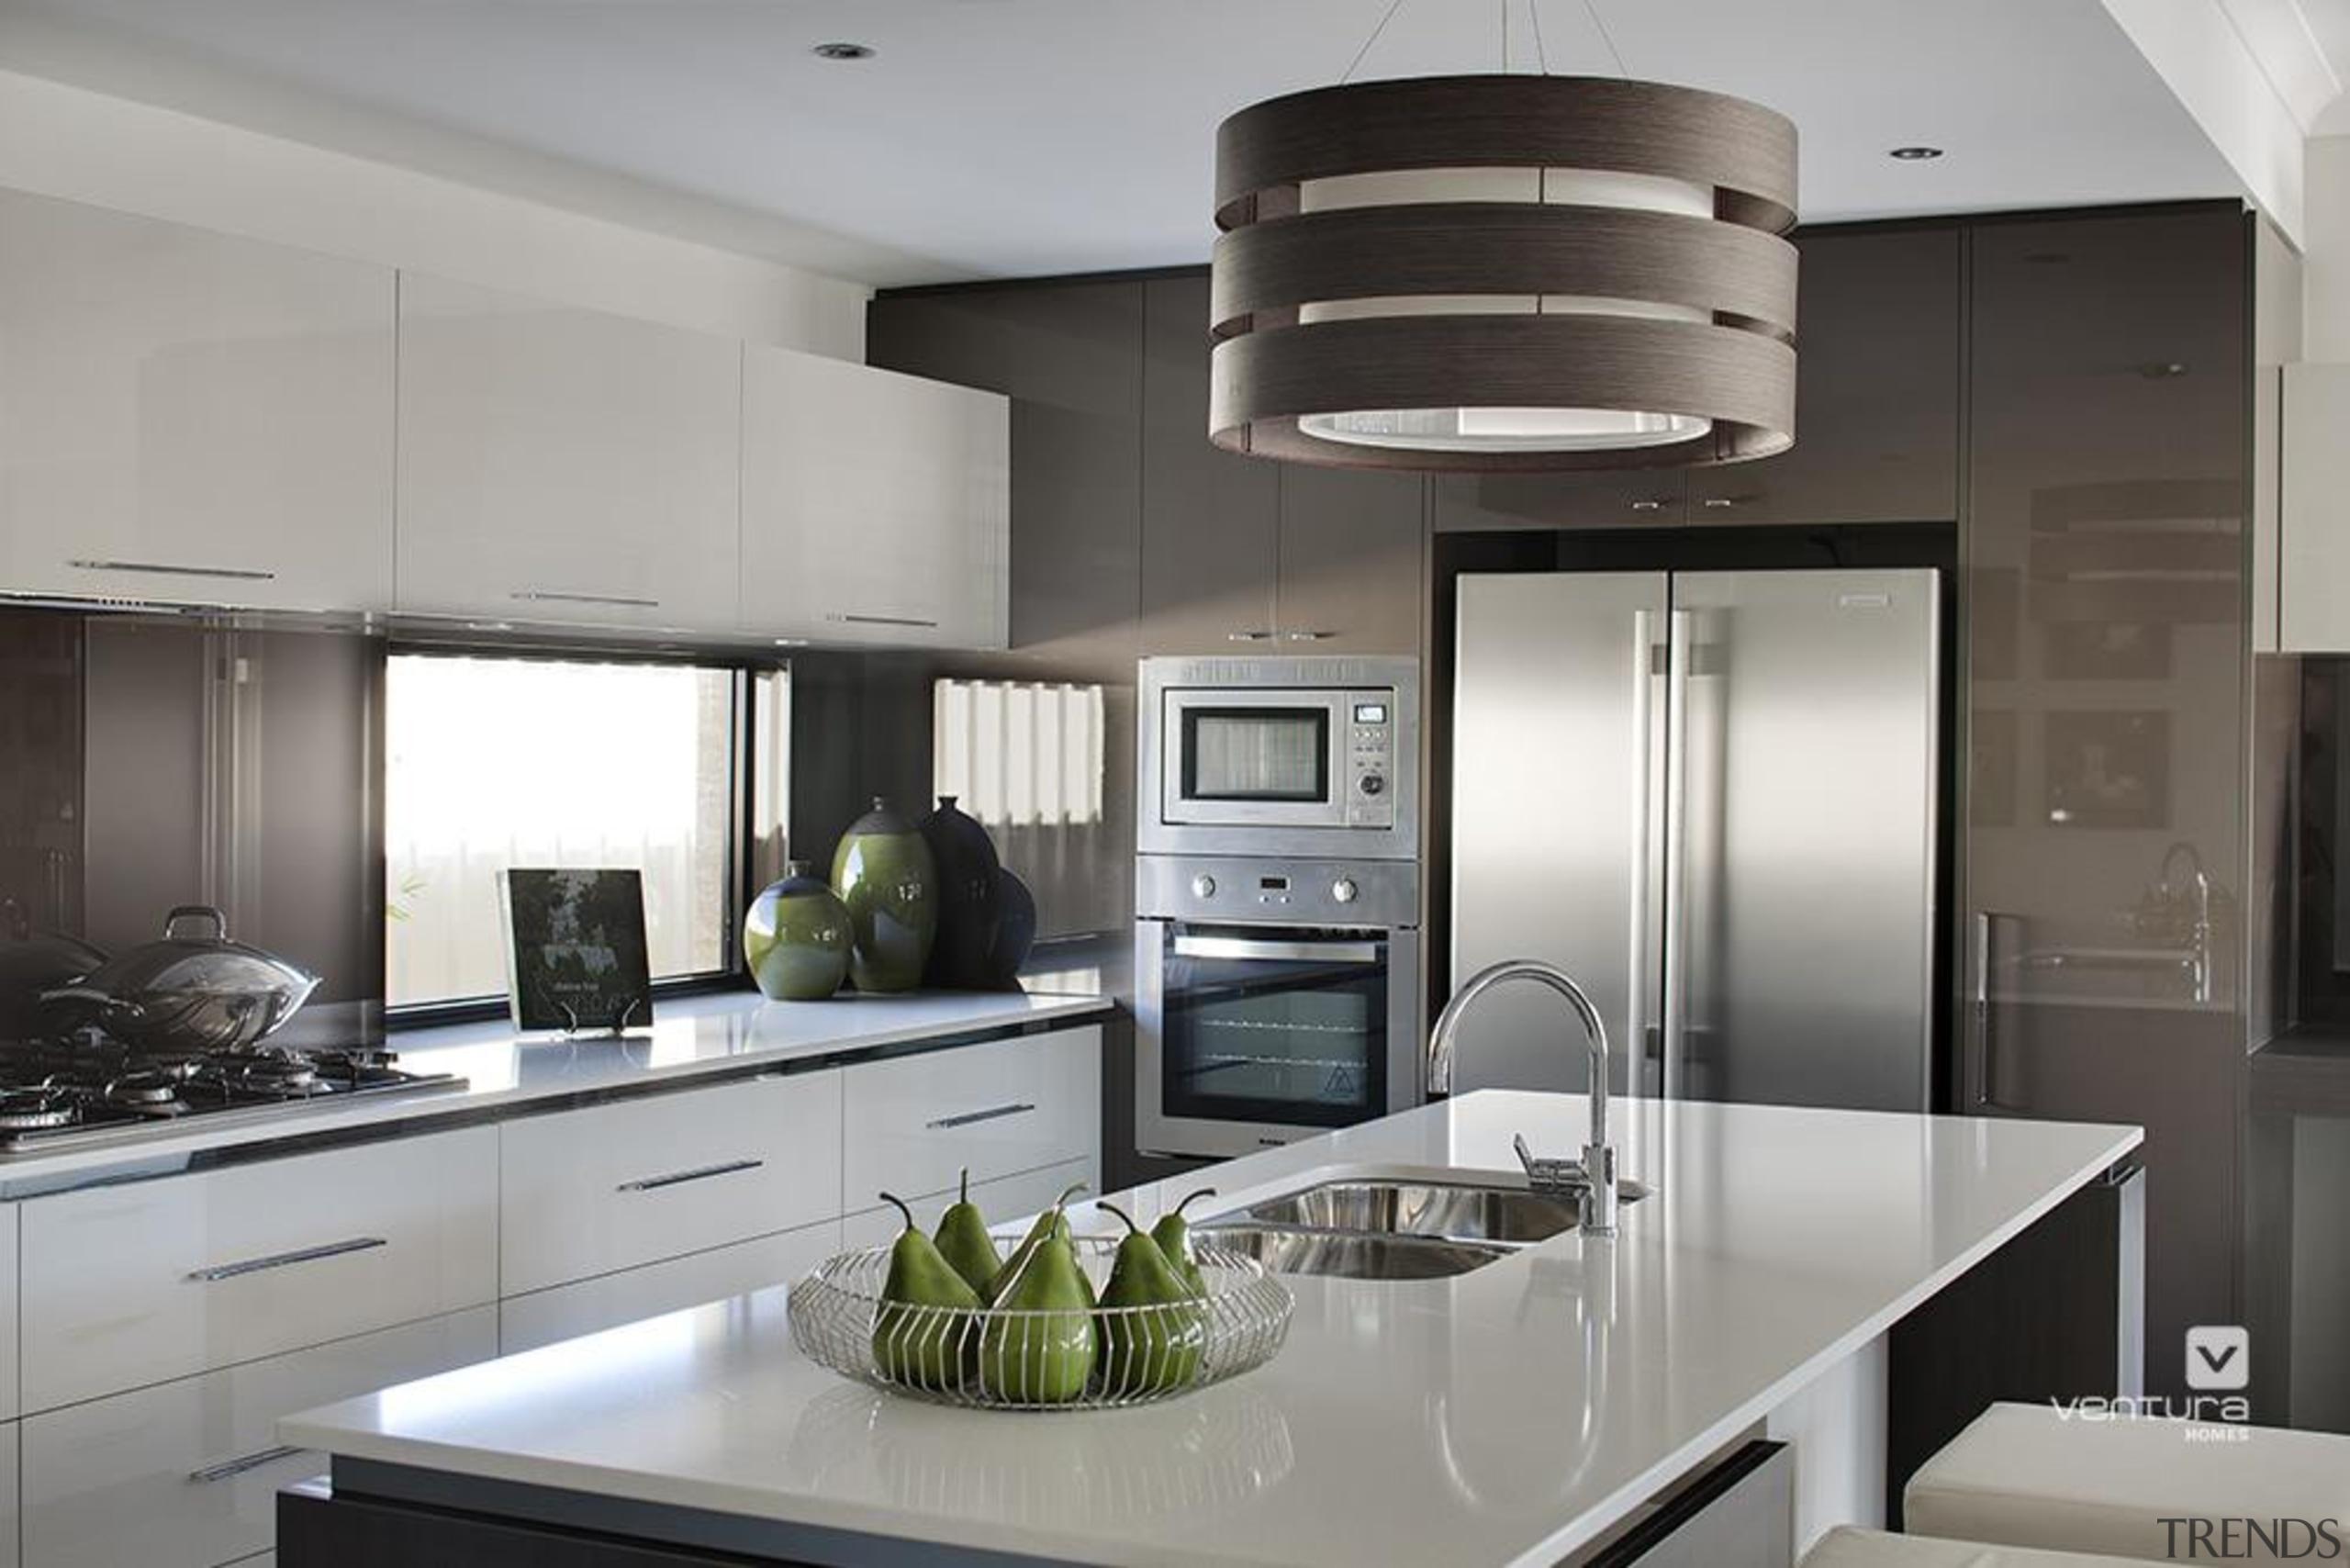 Kitchen design. - The Element Display Home - countertop, cuisine classique, home appliance, interior design, kitchen, gray